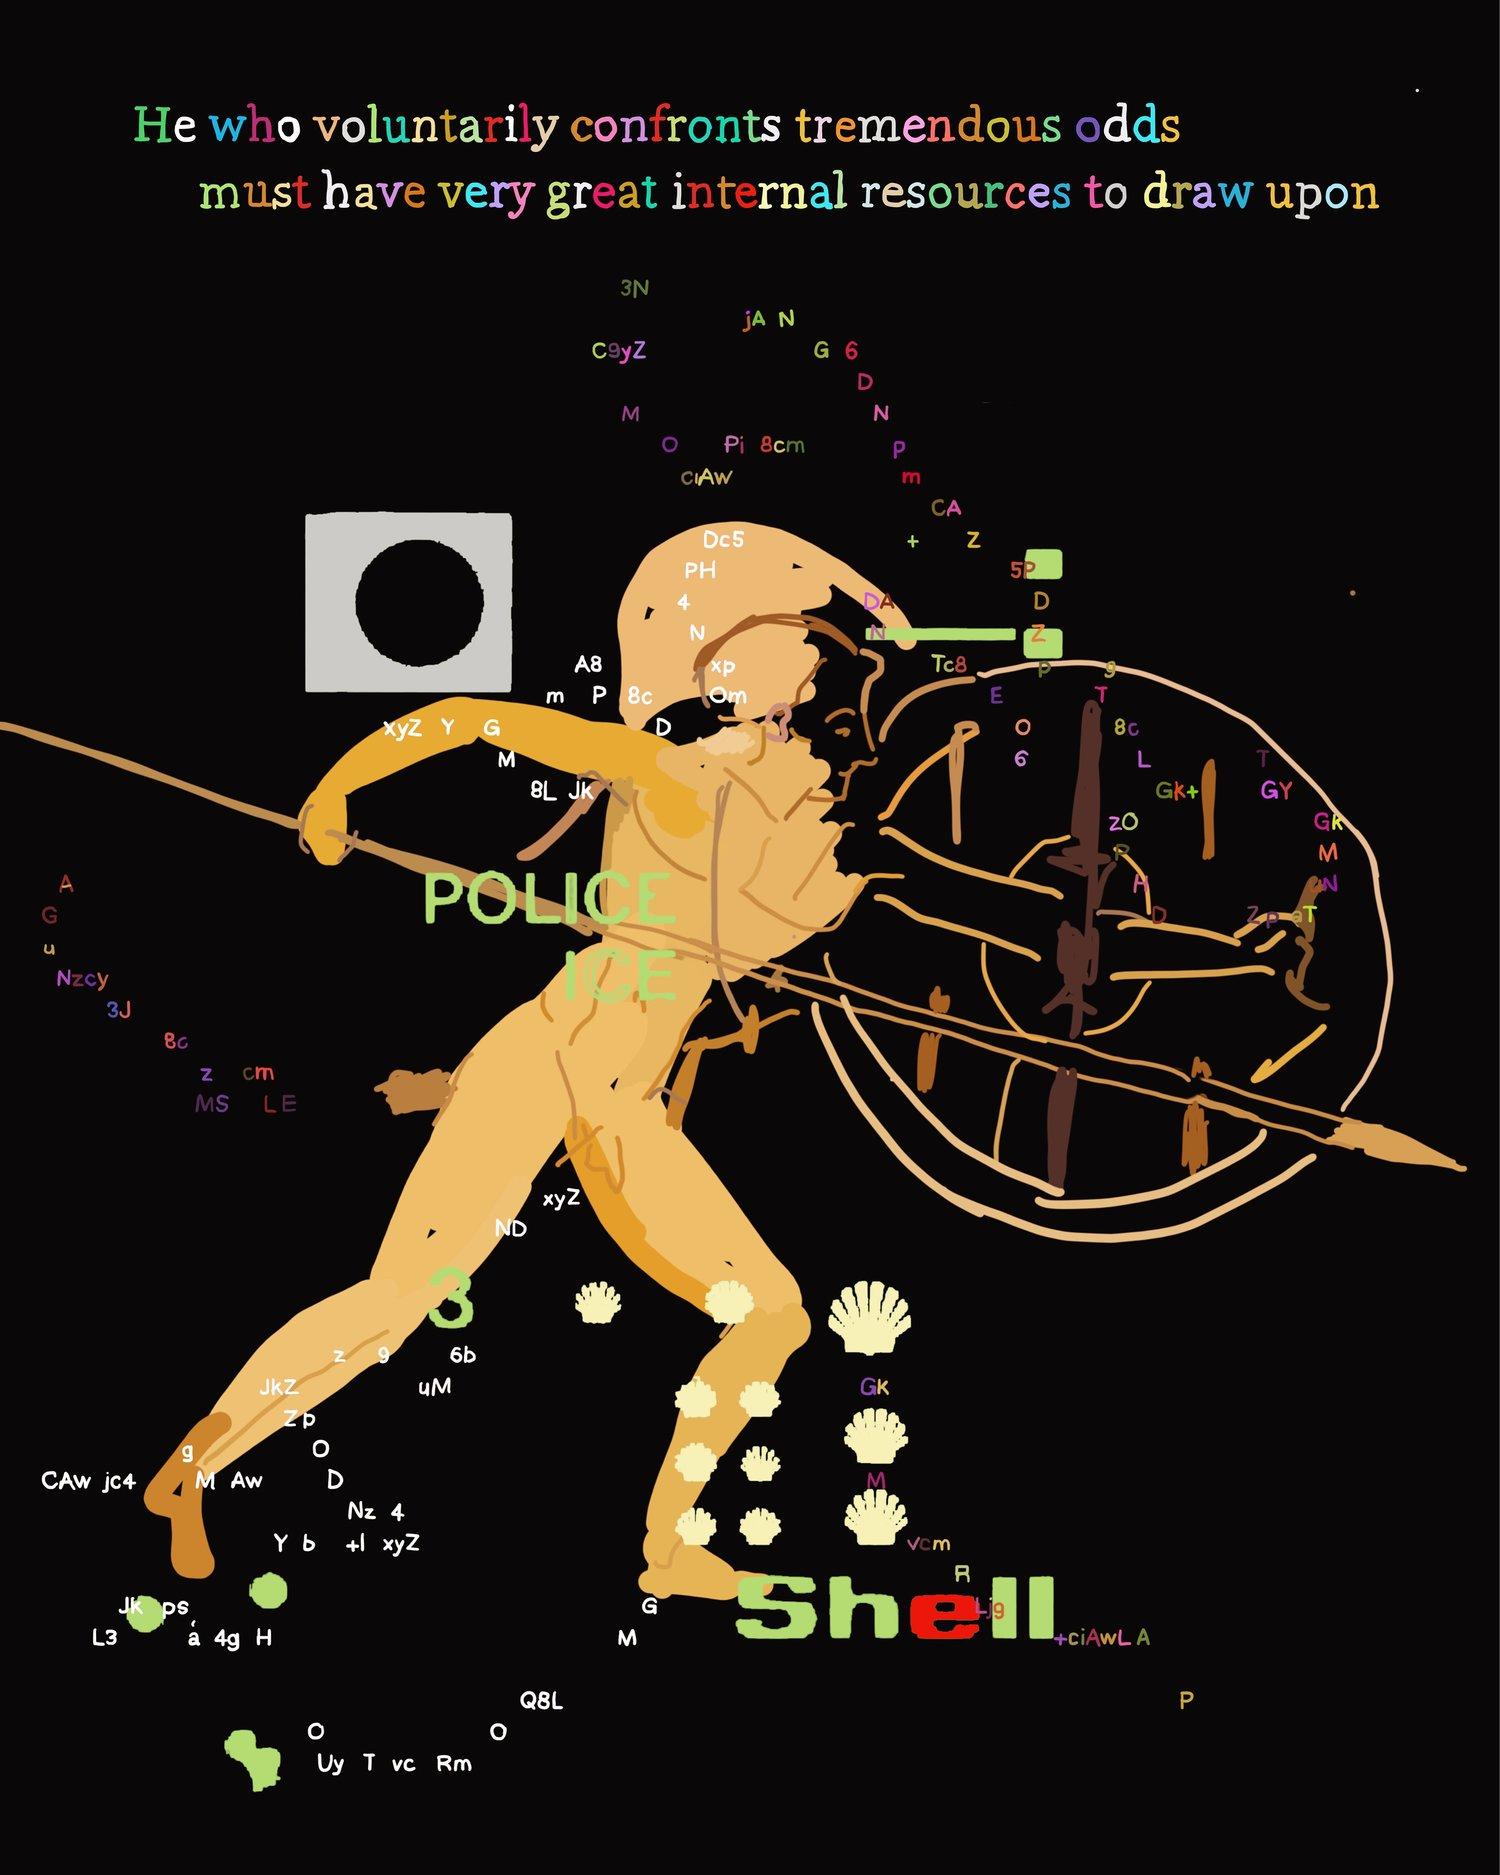 """The Peloponnesian War, Book 2.89"", iPhone X, digital image."